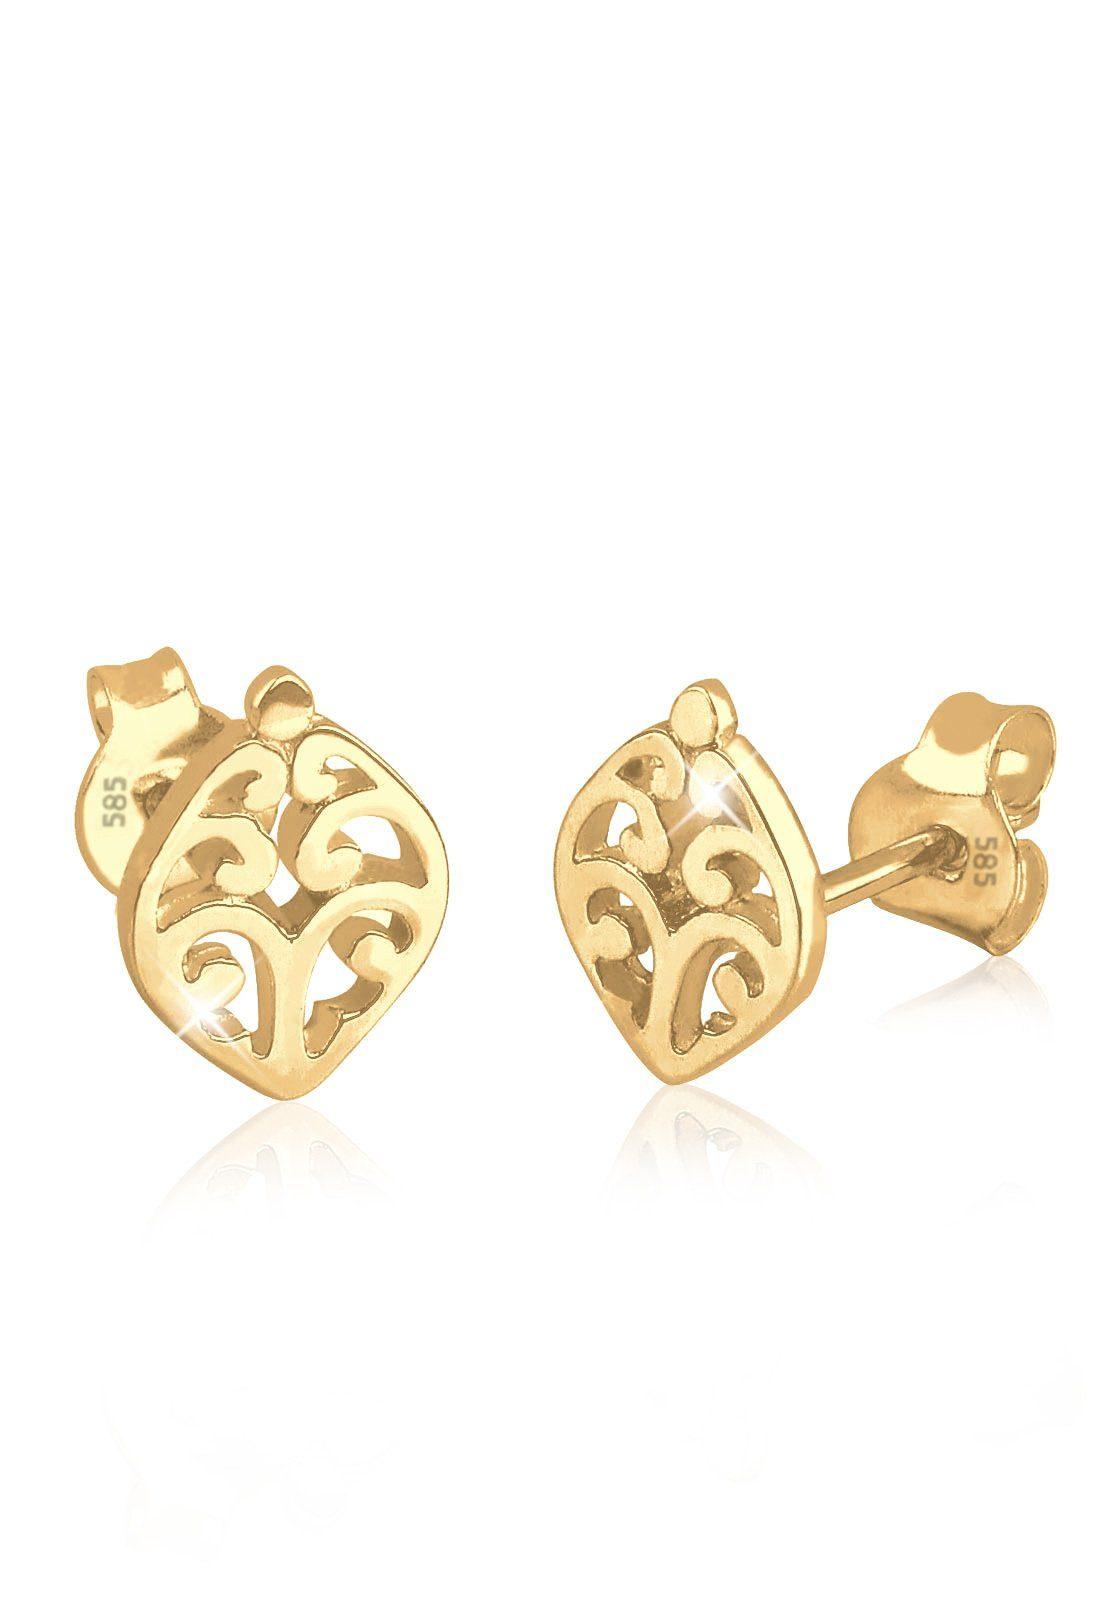 Elli Paar Ohrstecker »Ornament Filigran Hochwertig Floral 585 Gelbgold«